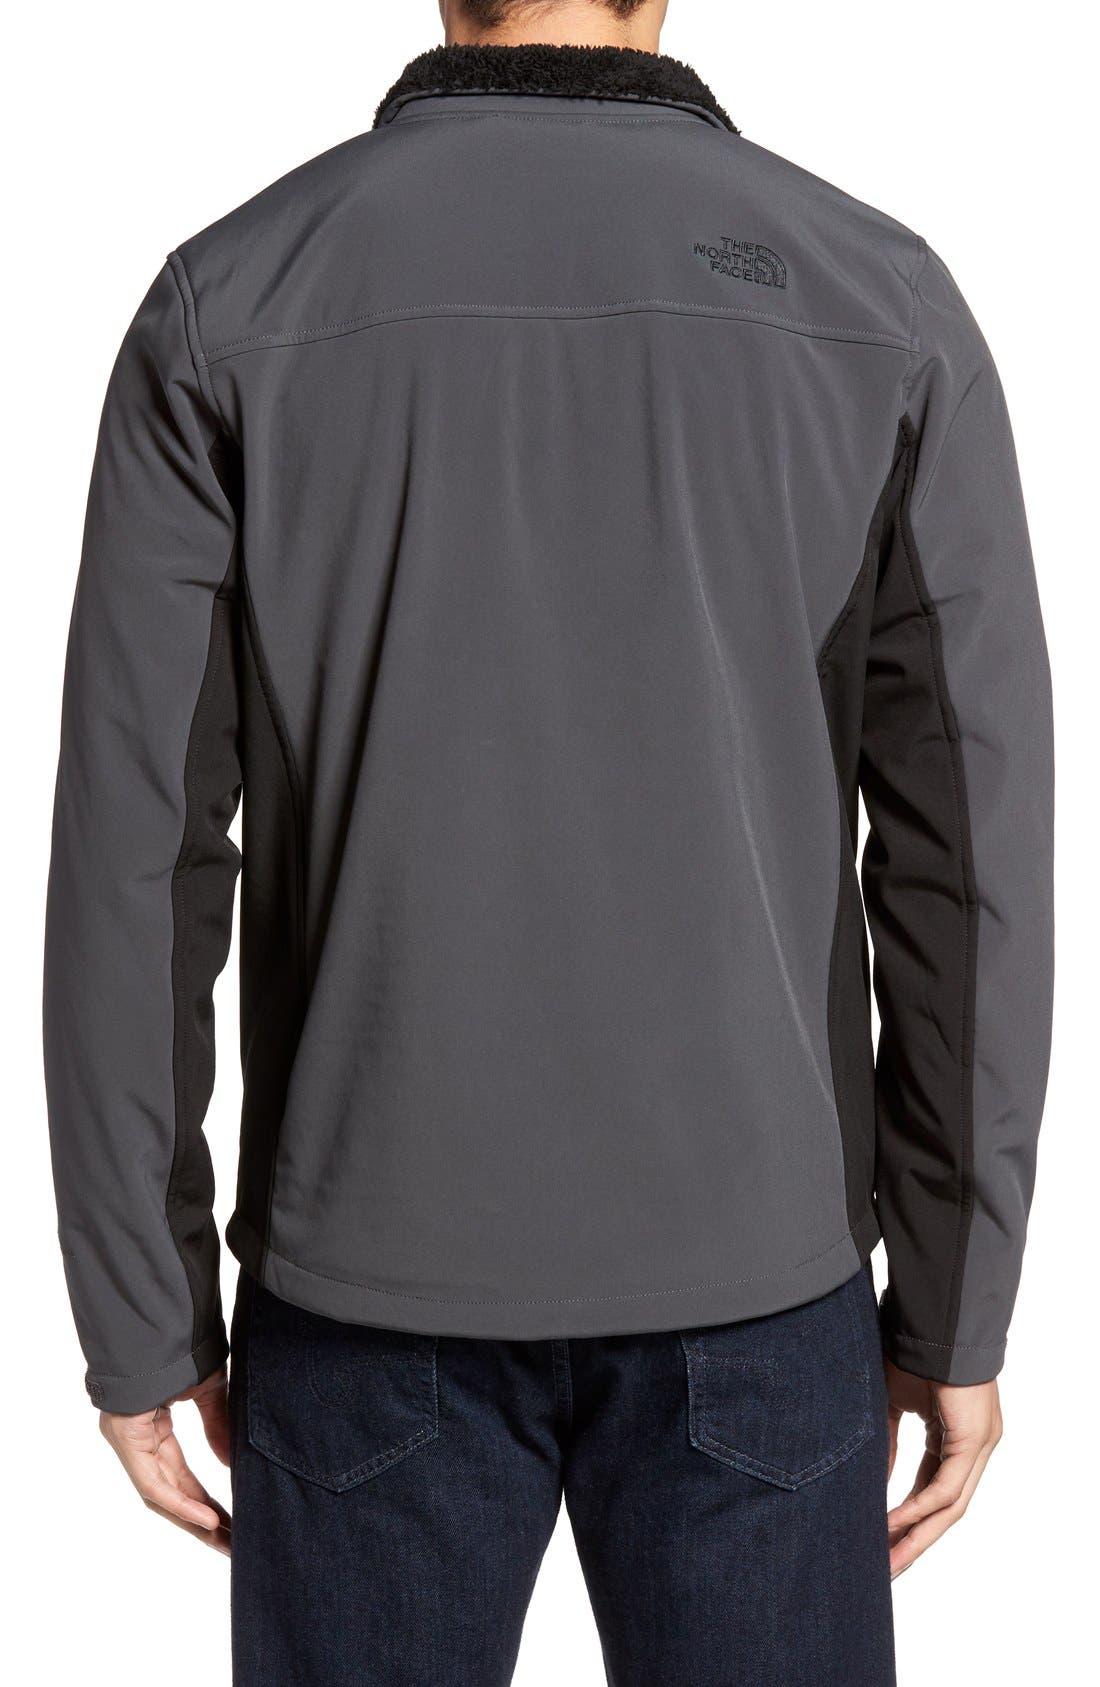 'Apex Chromium' Waterproof Thermal Jacket,                             Alternate thumbnail 2, color,                             Asphalt Grey/ Tnf Black